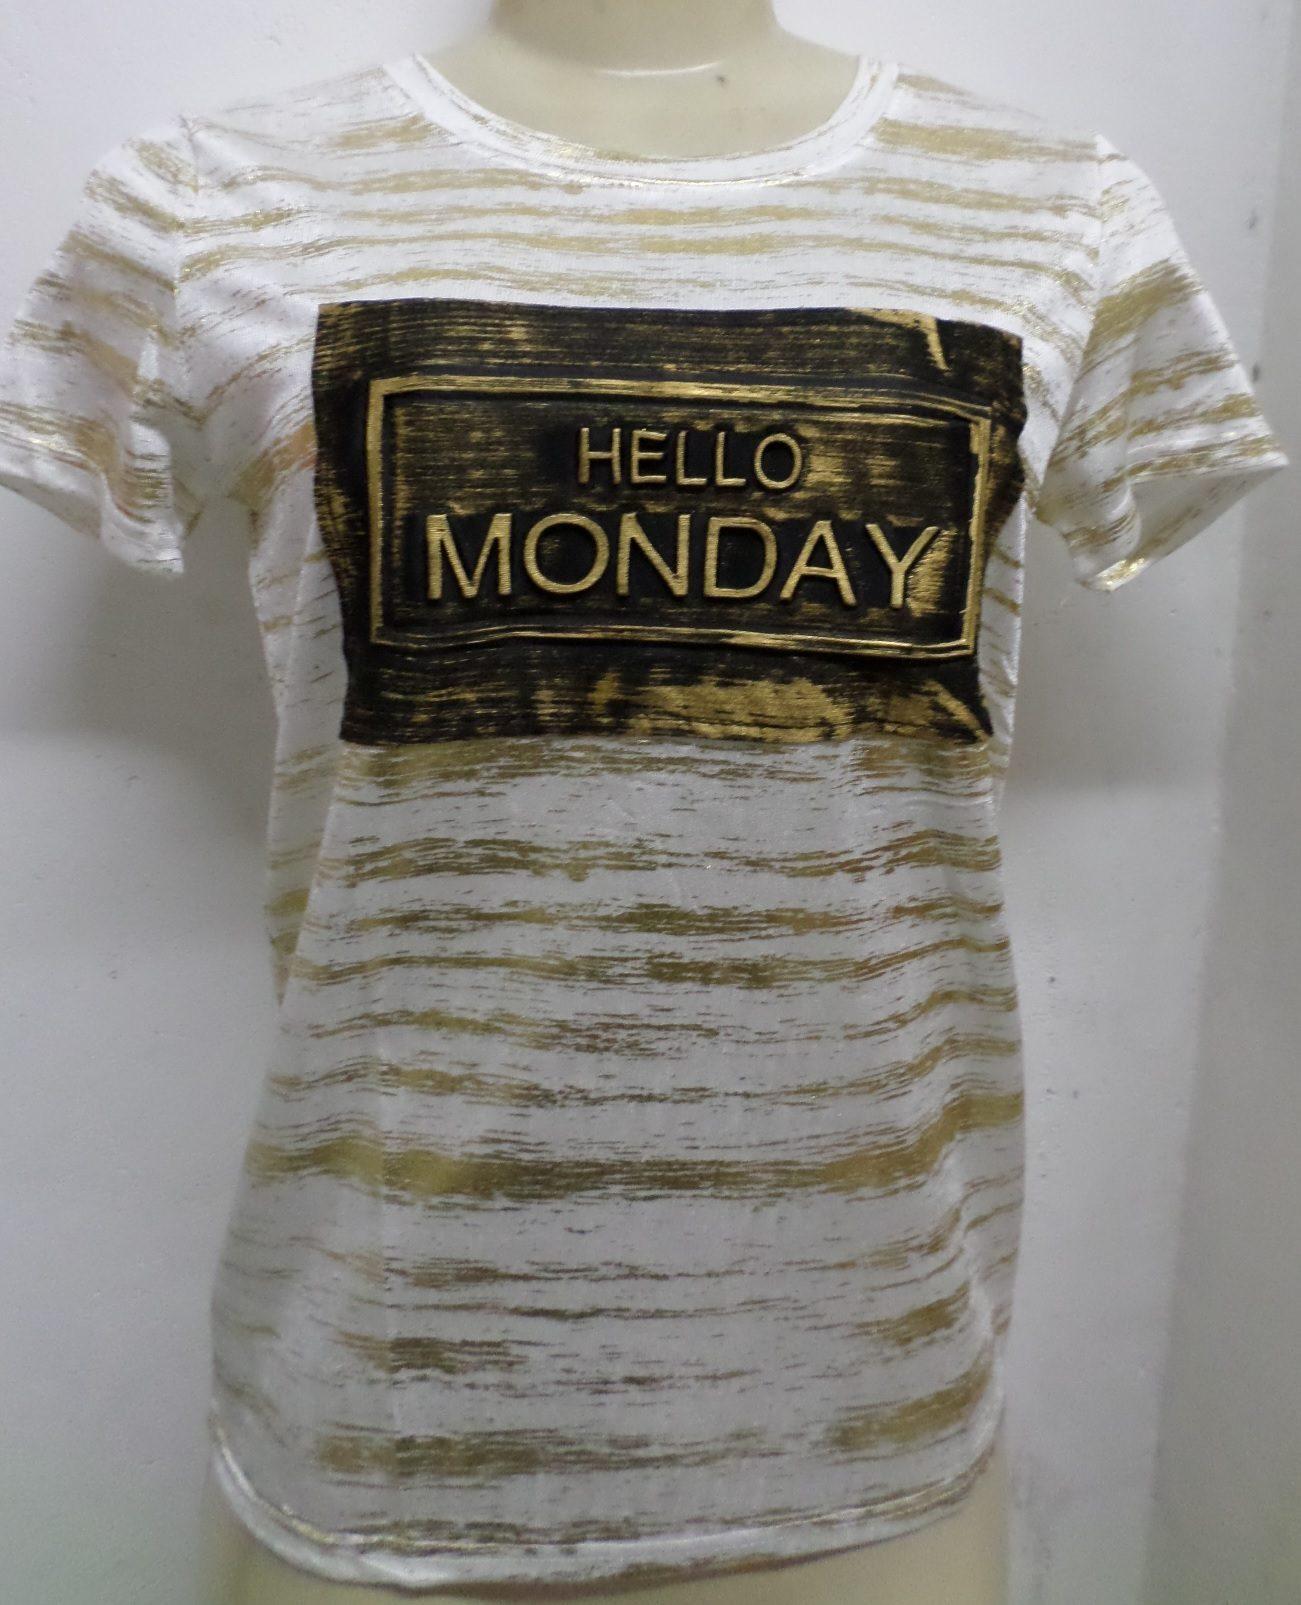 Blusa Feminina Estampa Alto Relevo - R$19,99 - [PINK137]